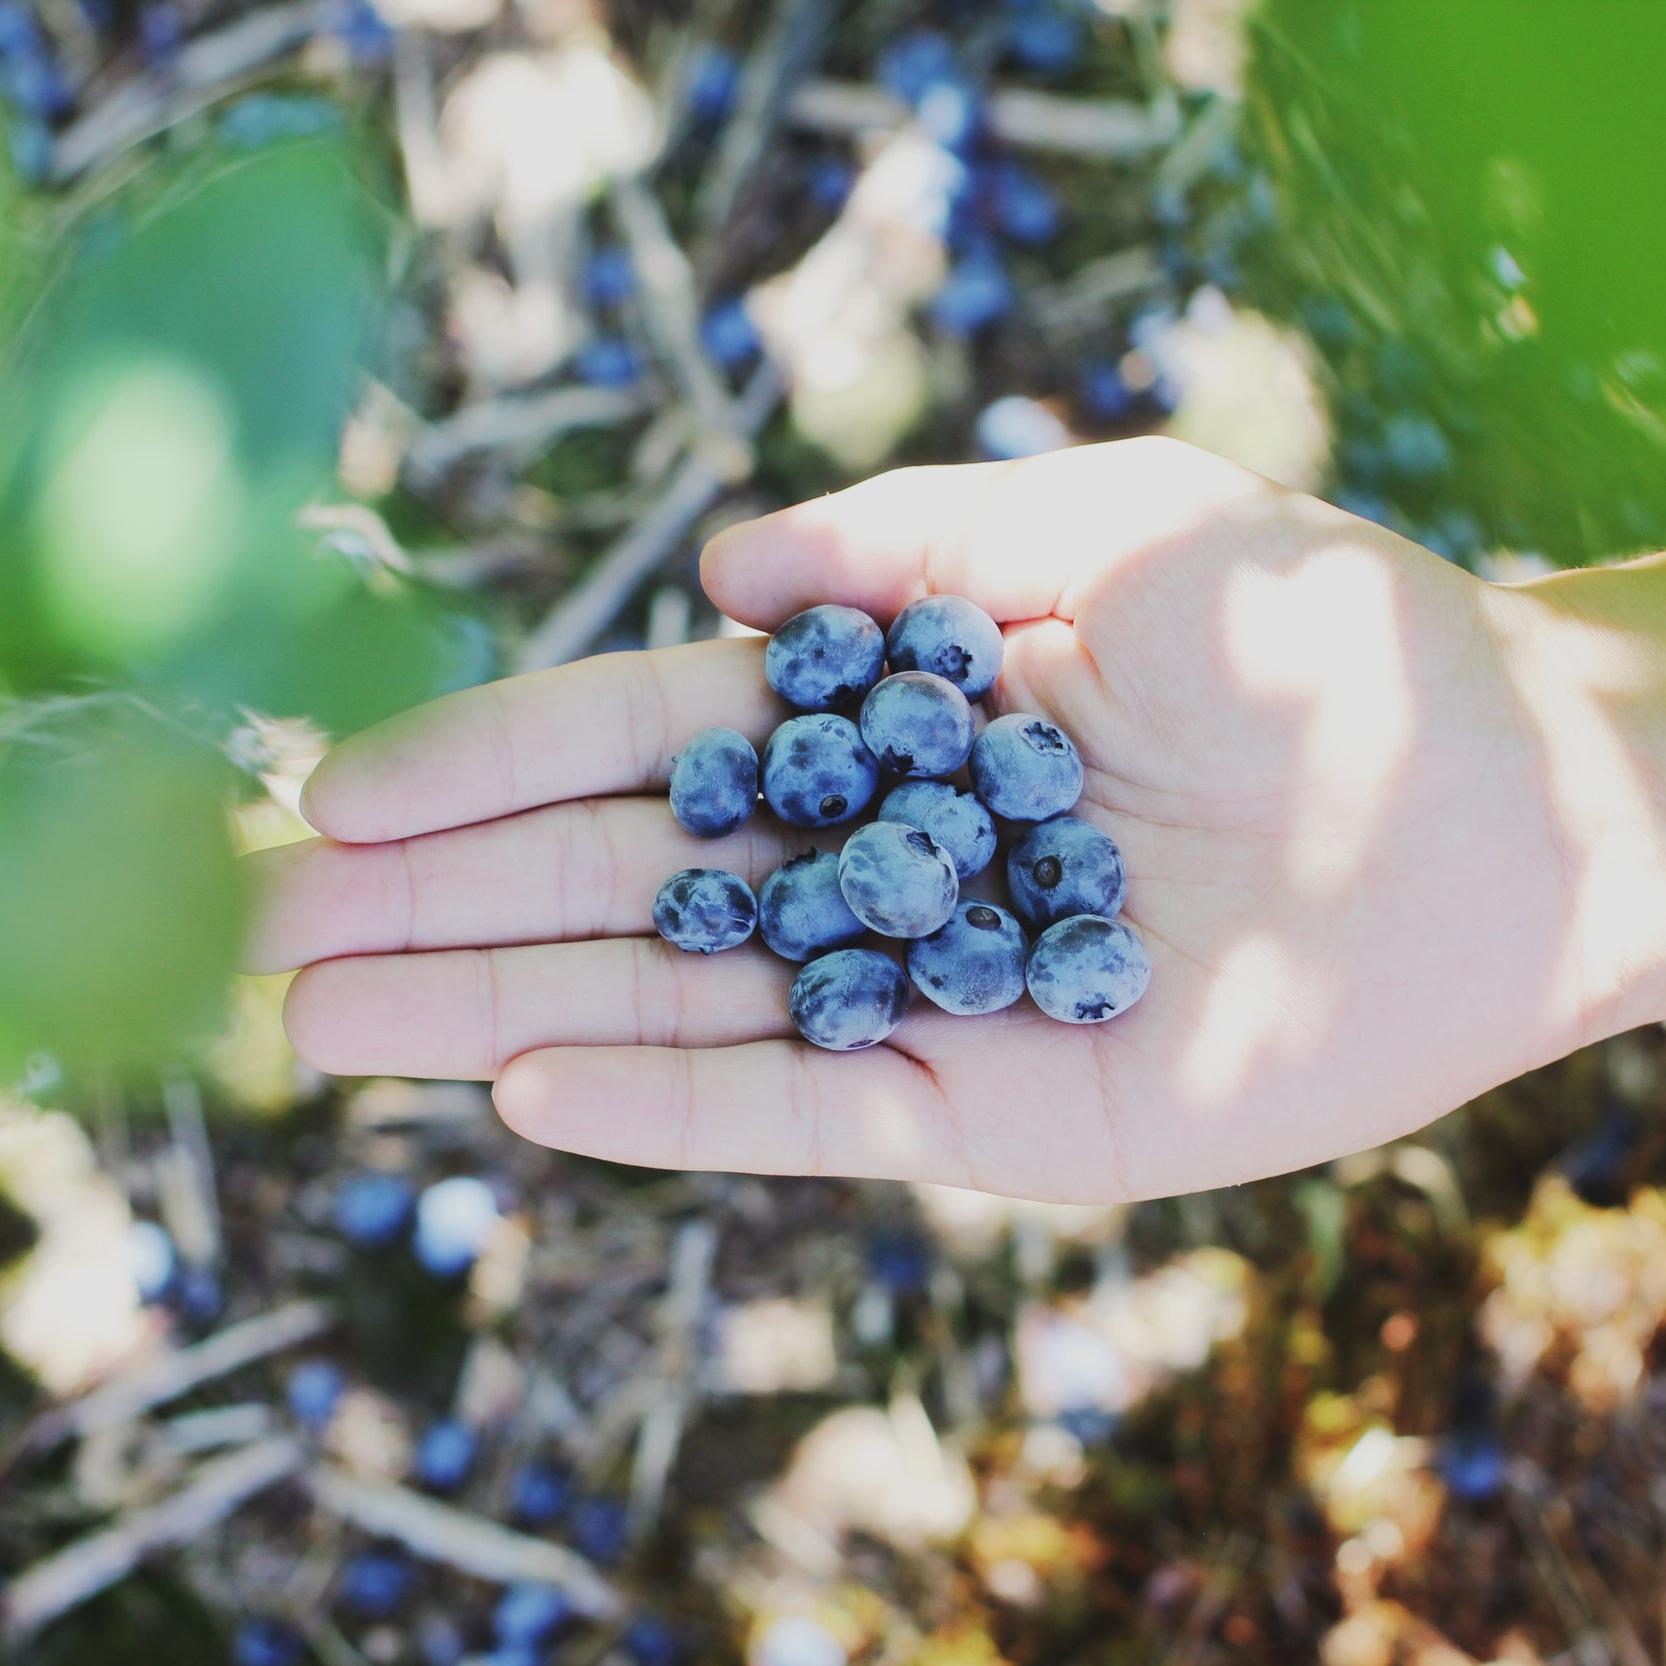 florida-blueberries-in-hand.jpg